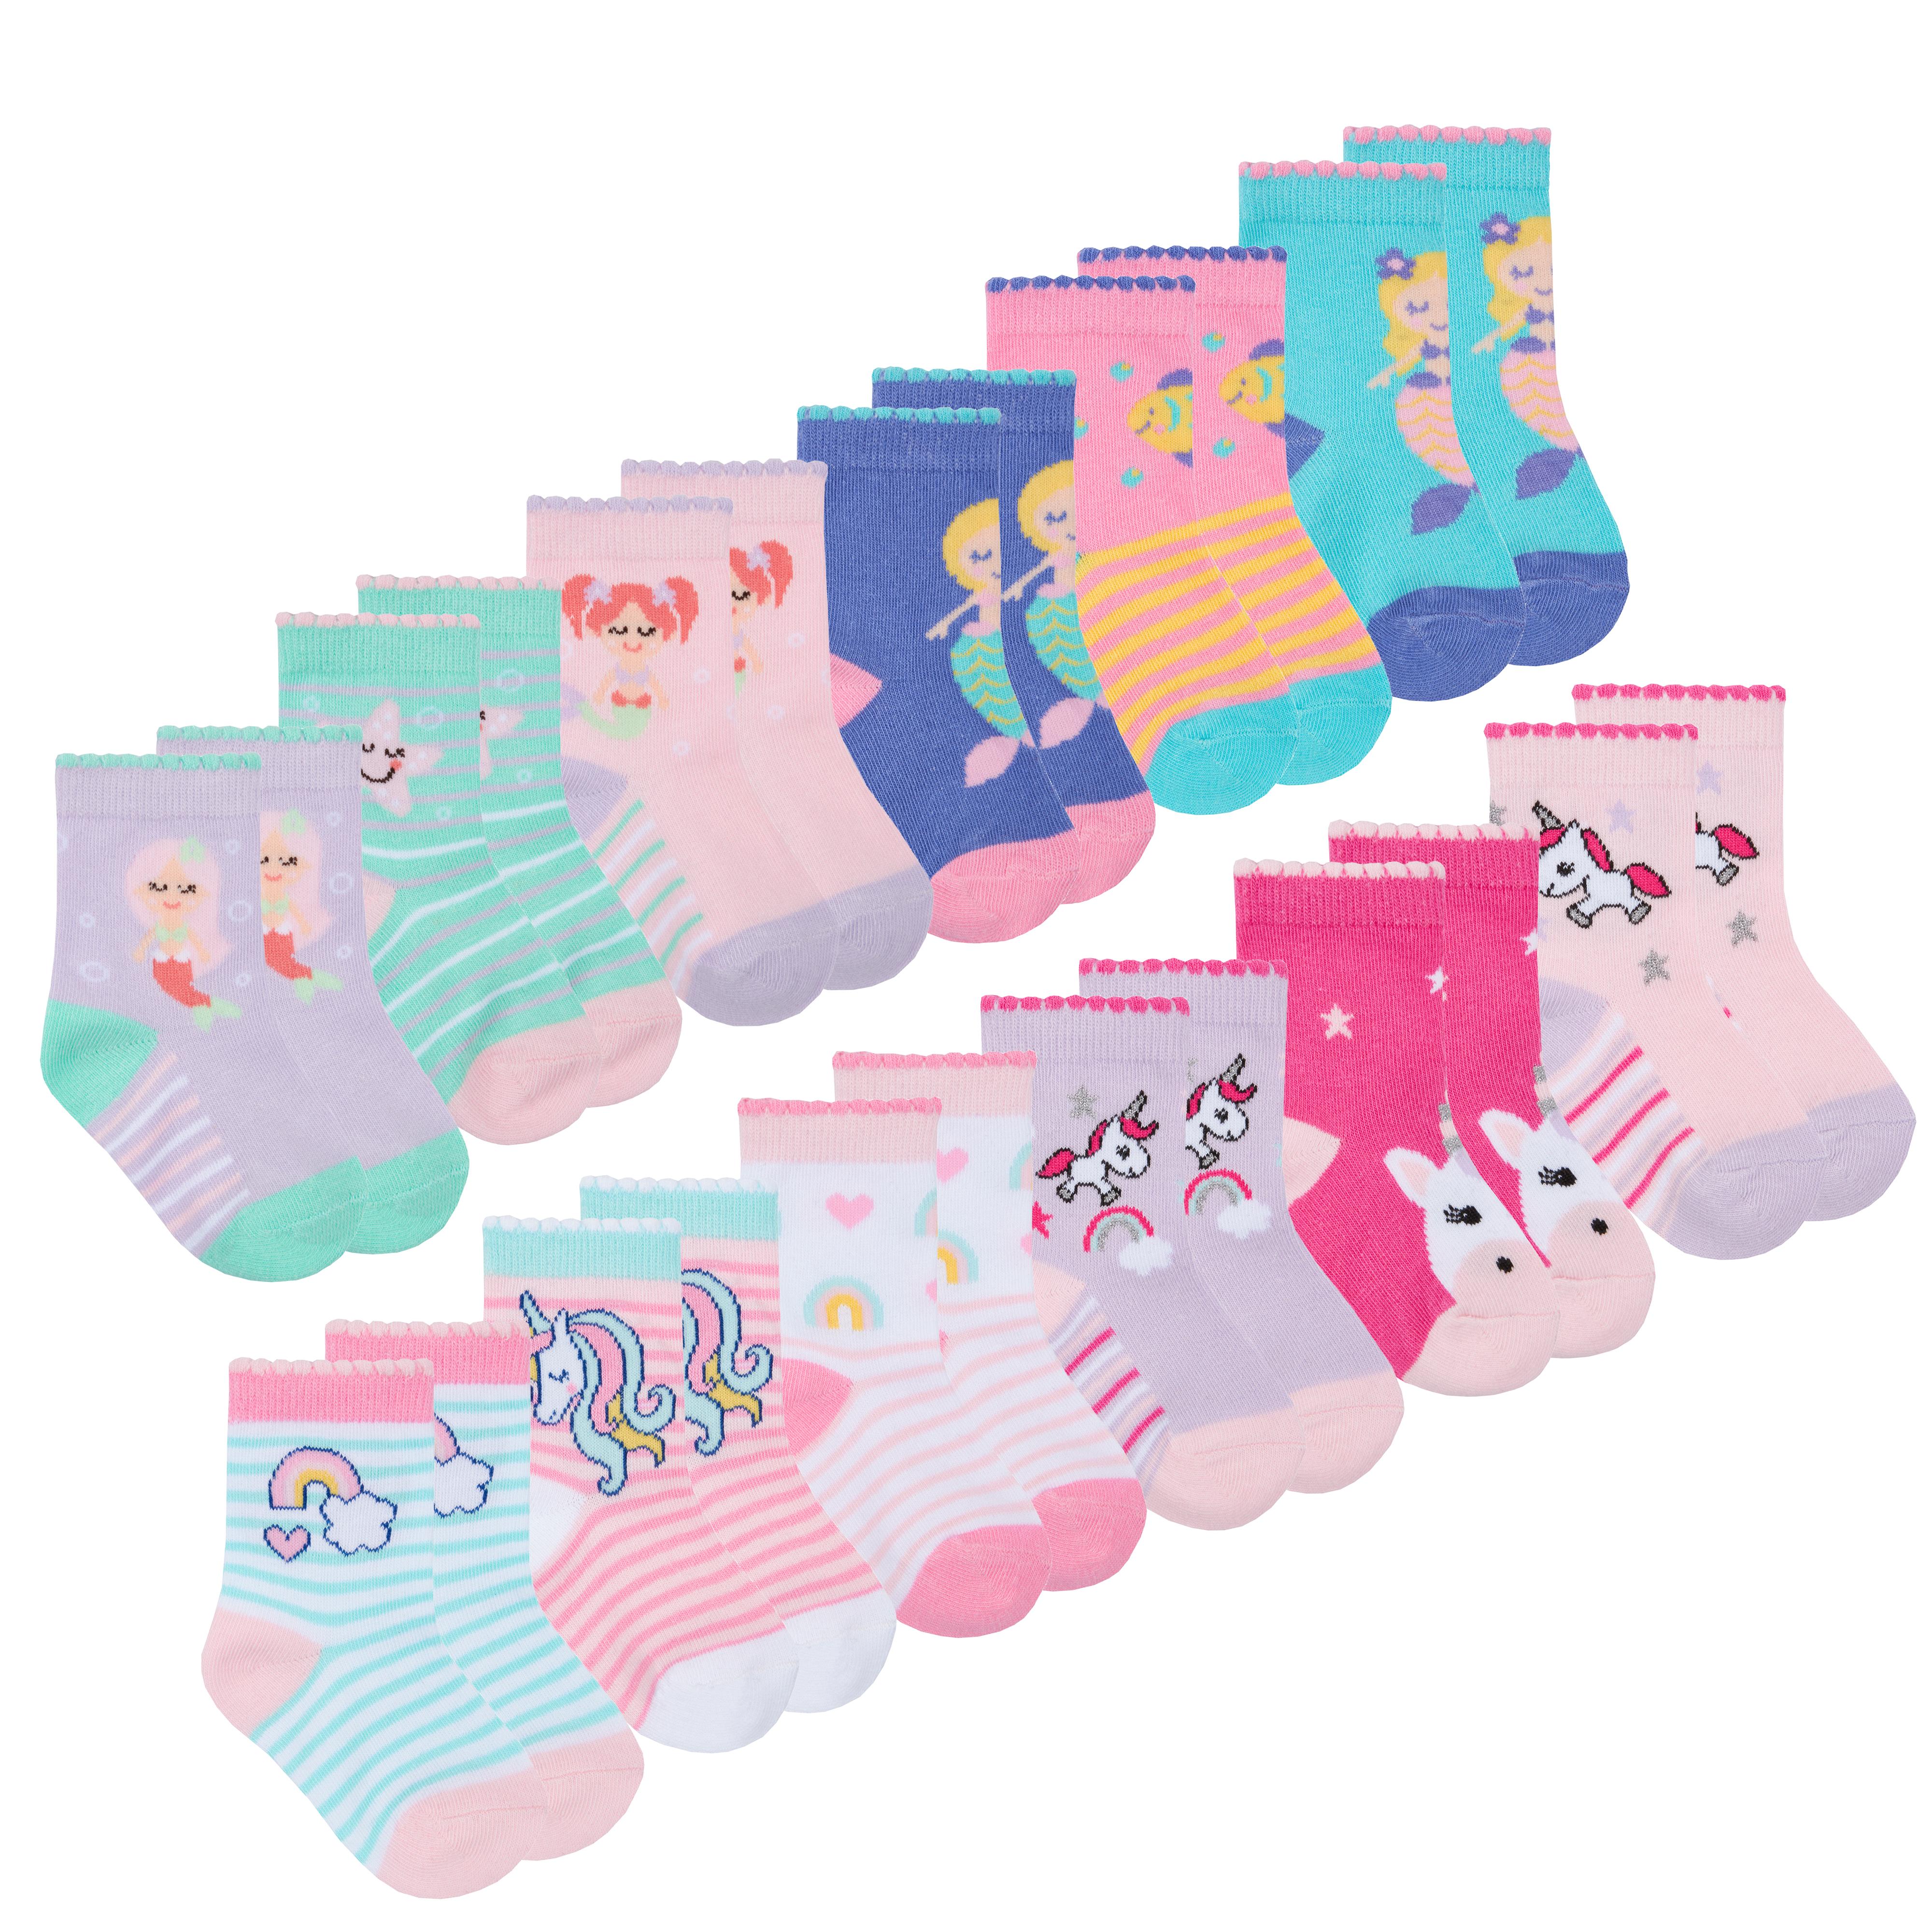 Newborn Toddler Baby Girls Novelty Socks Cotton Rich 3 or 6 Pairs Size 0-5.5 UK